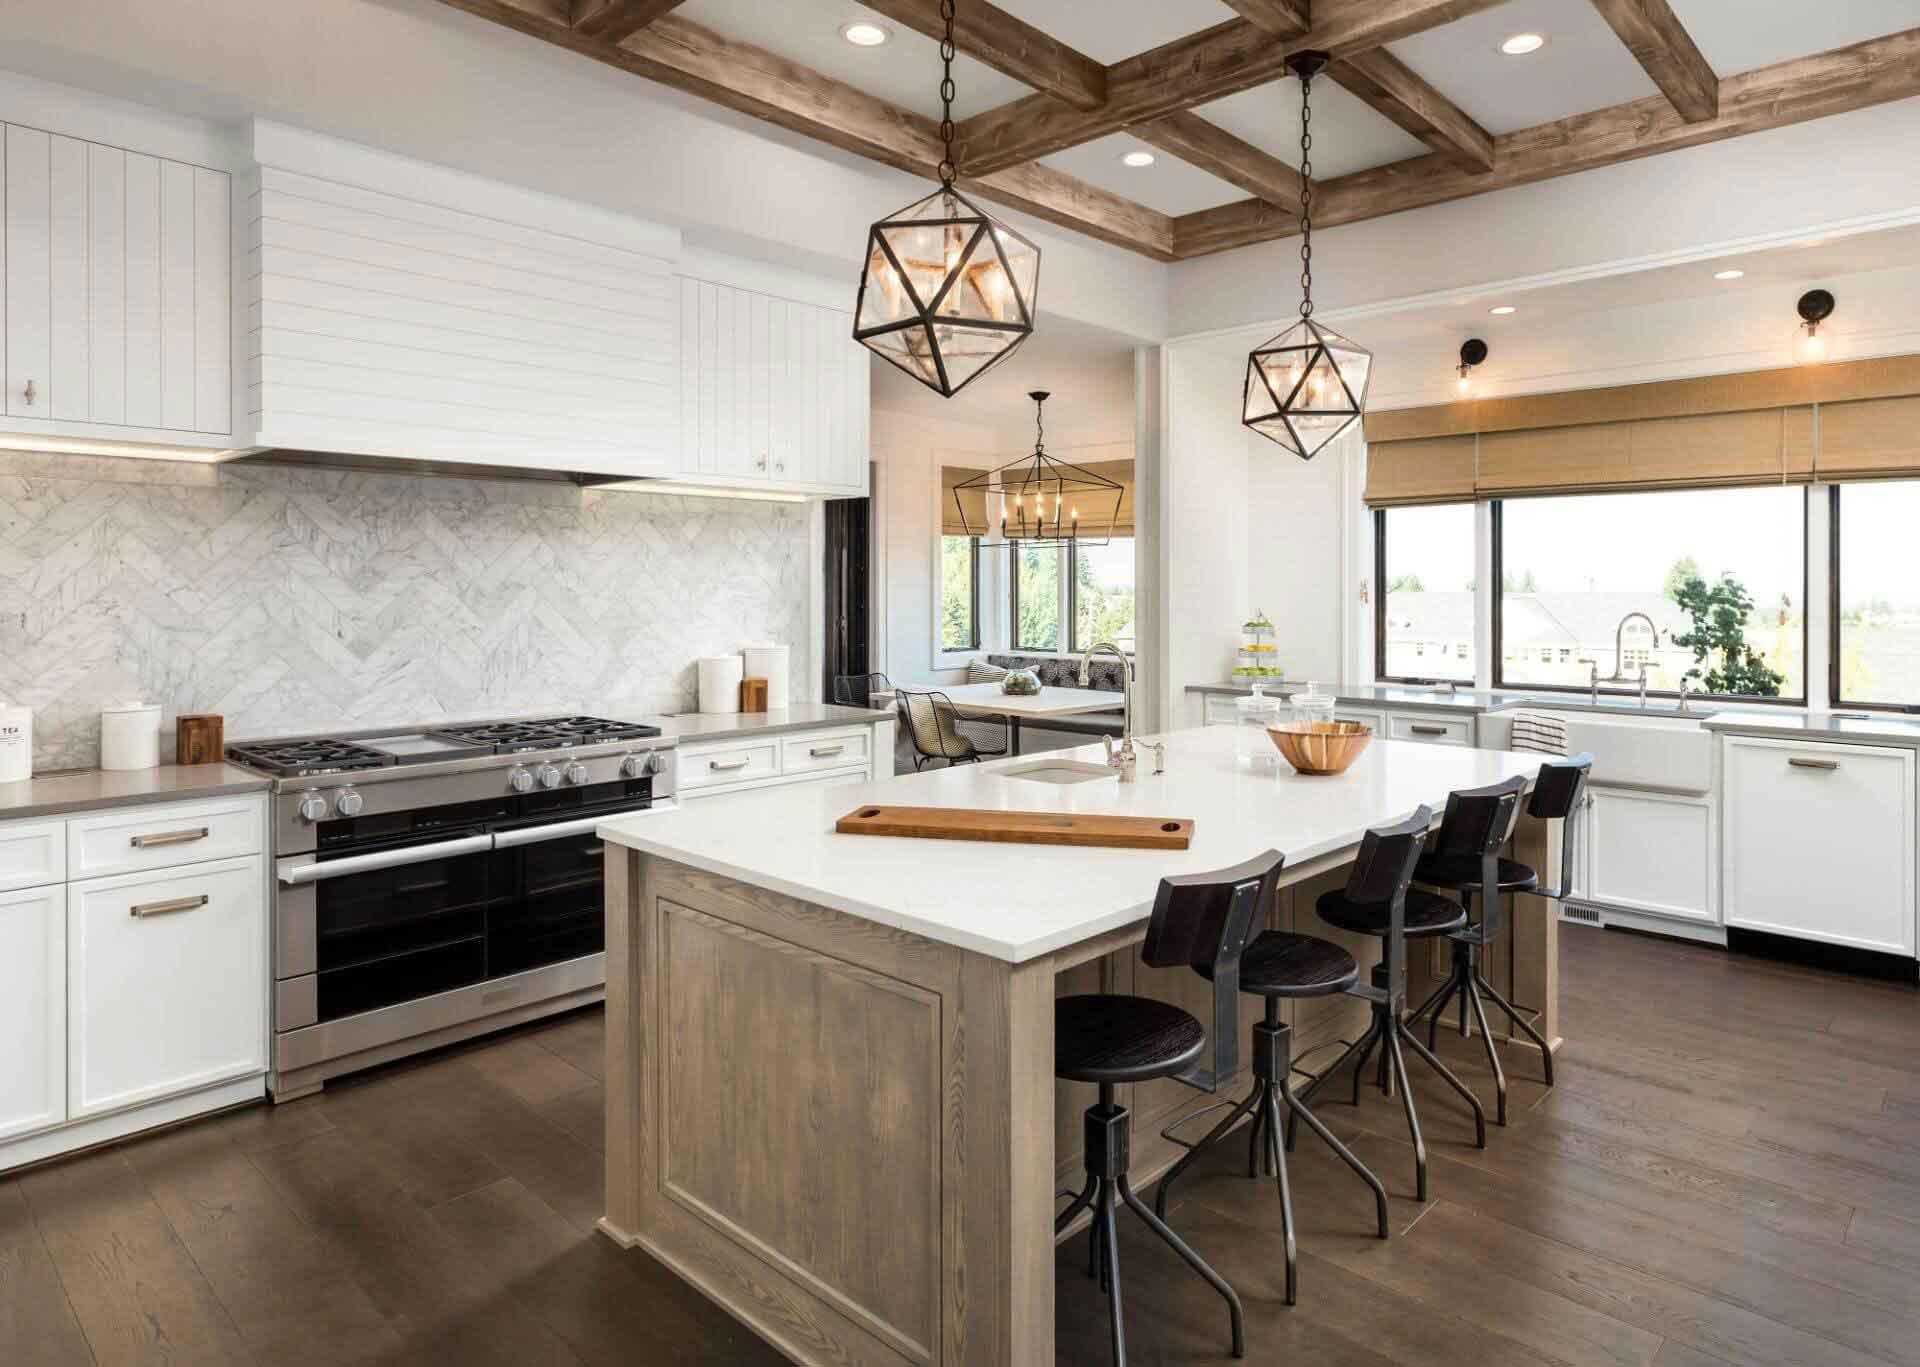 Luxury Custom Kitchen Built by Hibbs Homes in Salt Lake City